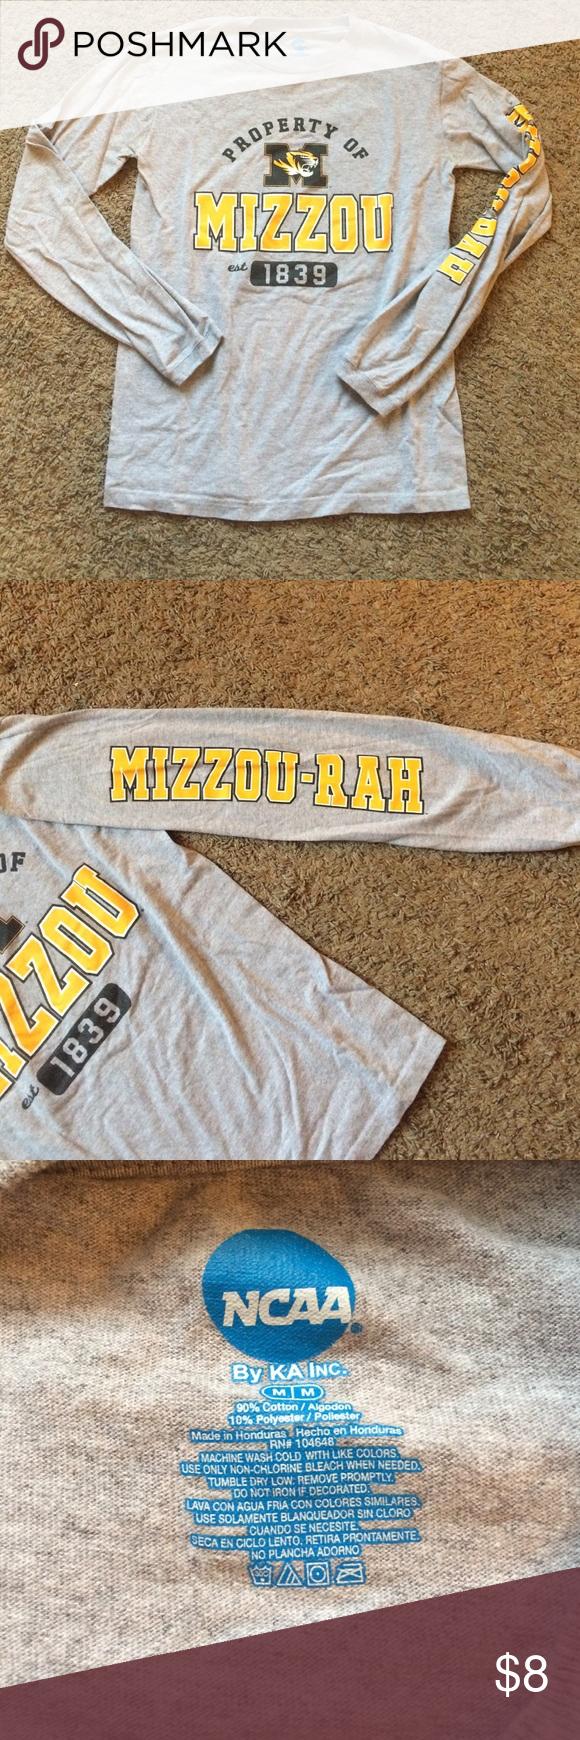 Mizzou long sleeve tee Great condition, mizzou long sleeve unisex tshirt. Mizzou-rah down the side on the sleeve. Smoke free home! NCAA Tops Tees - Long Sleeve